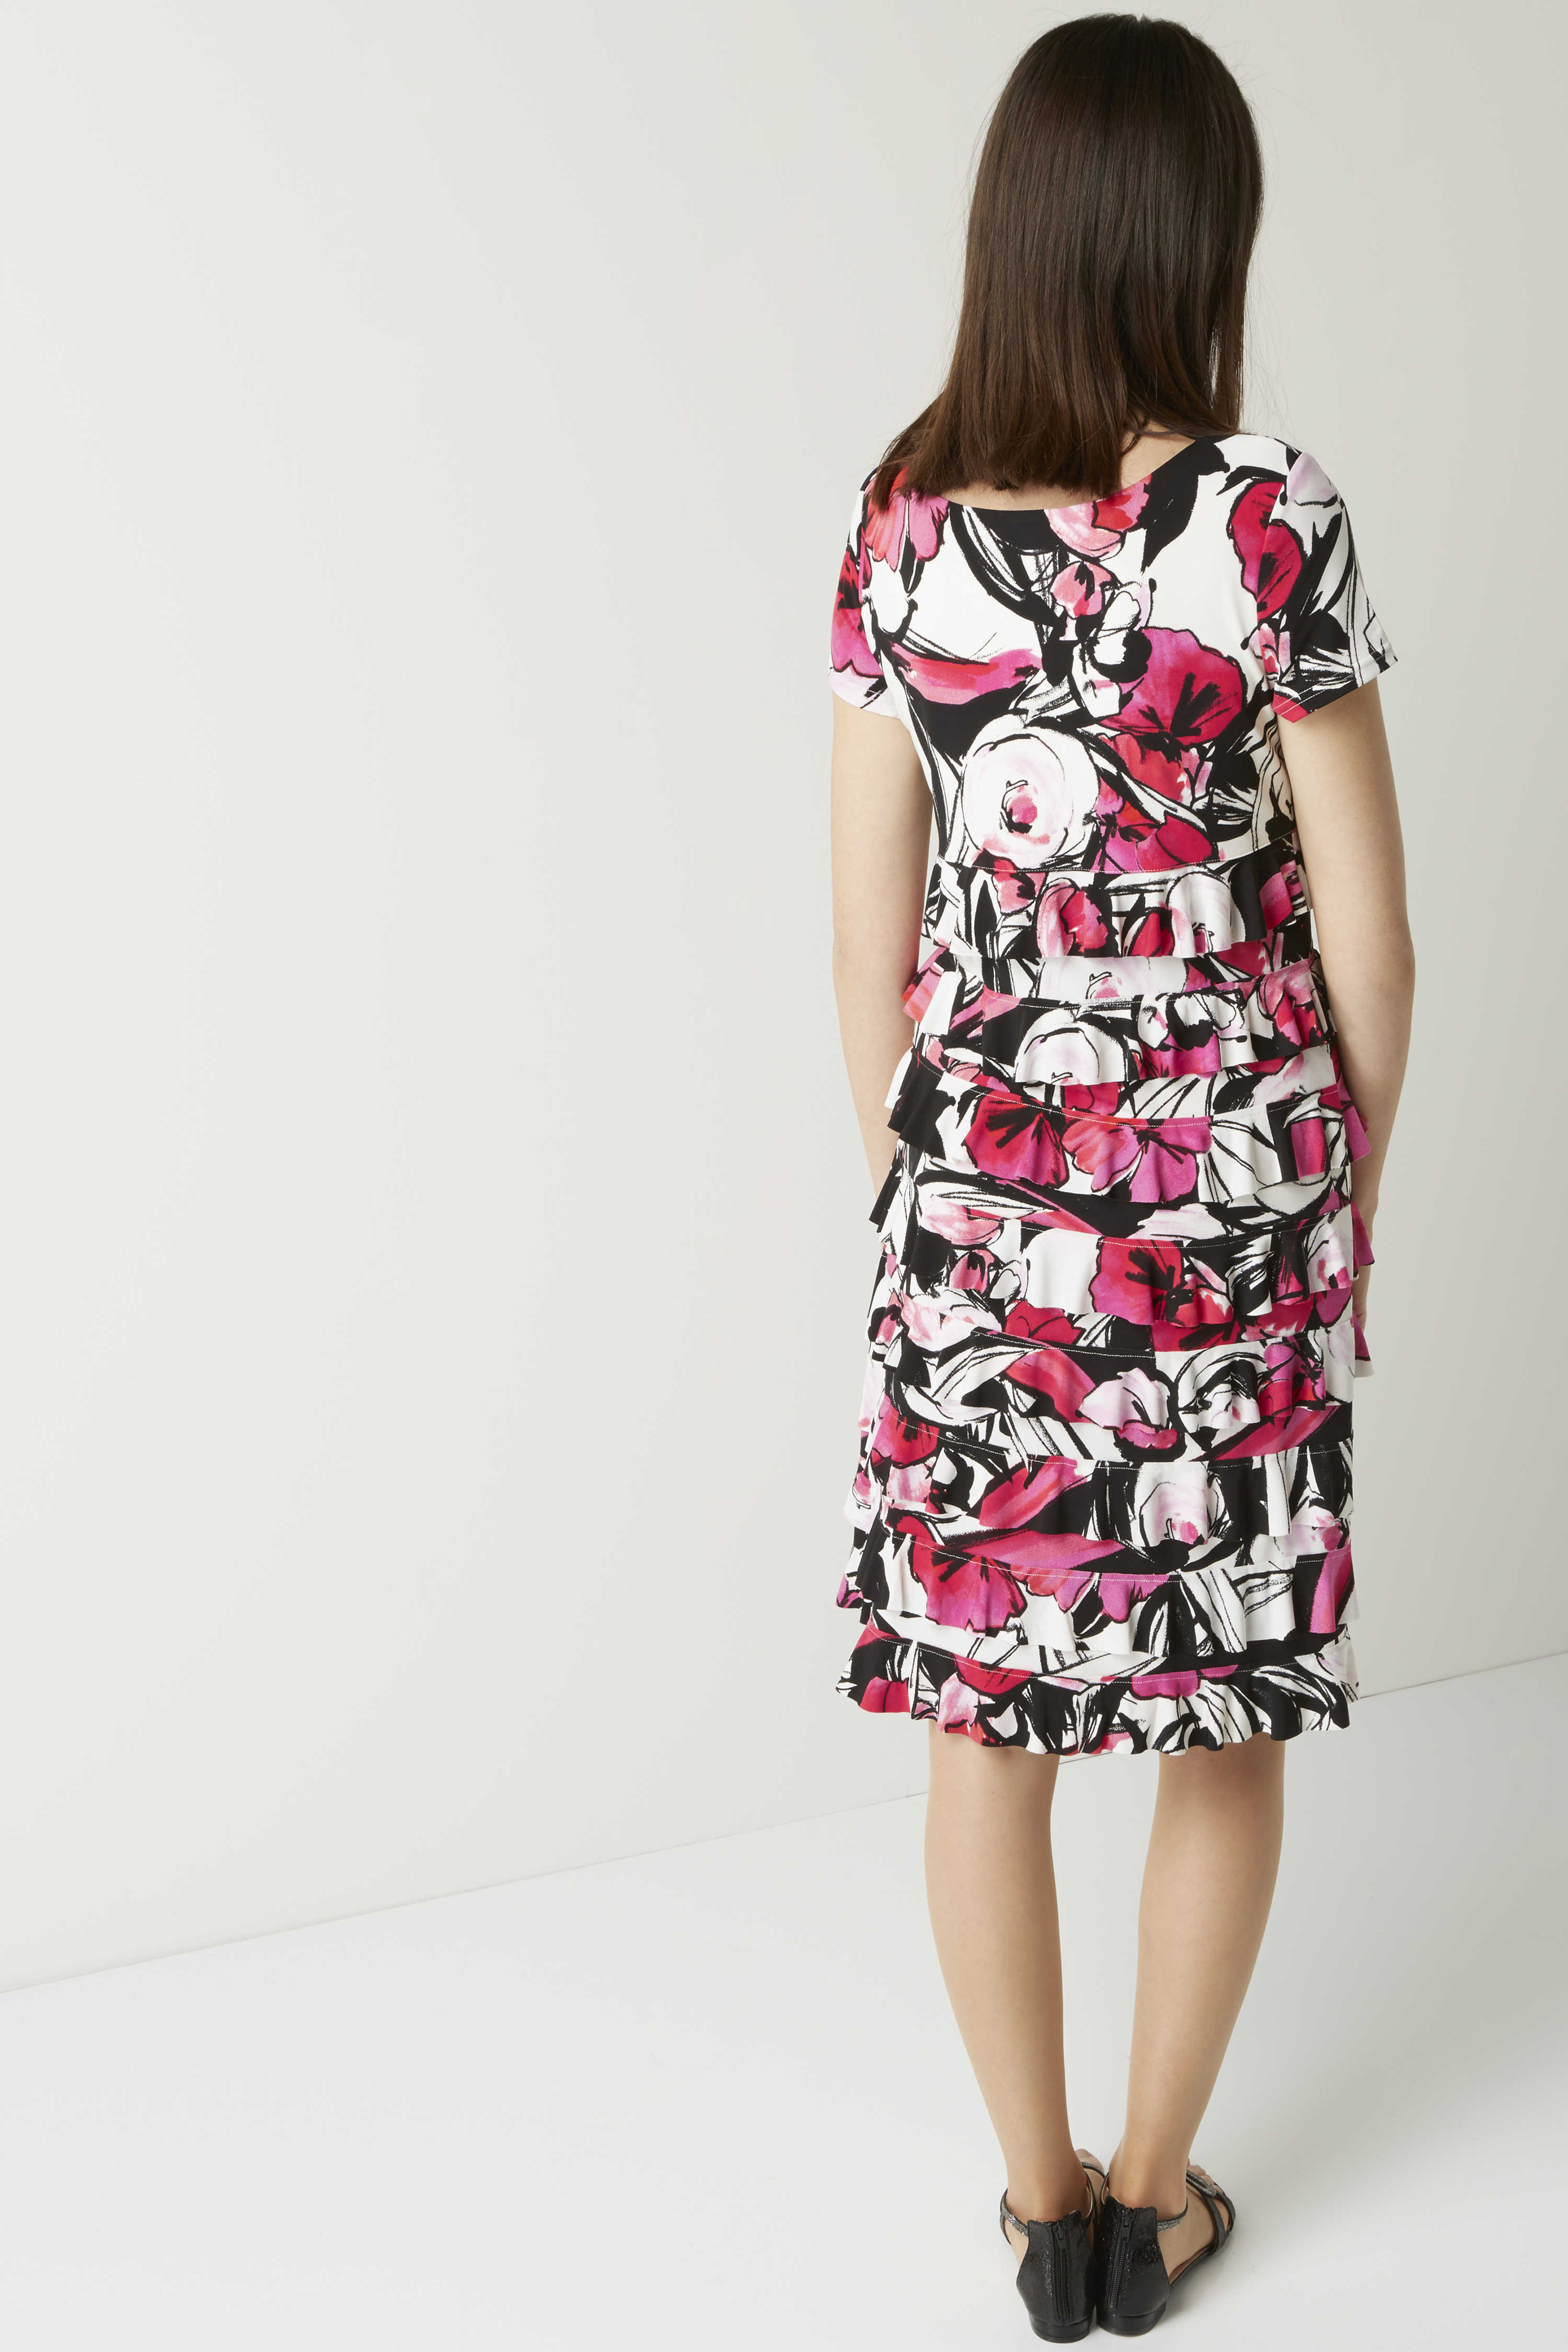 Roman Originals Ladies Floral Print Frill Jersey Dress Cerise